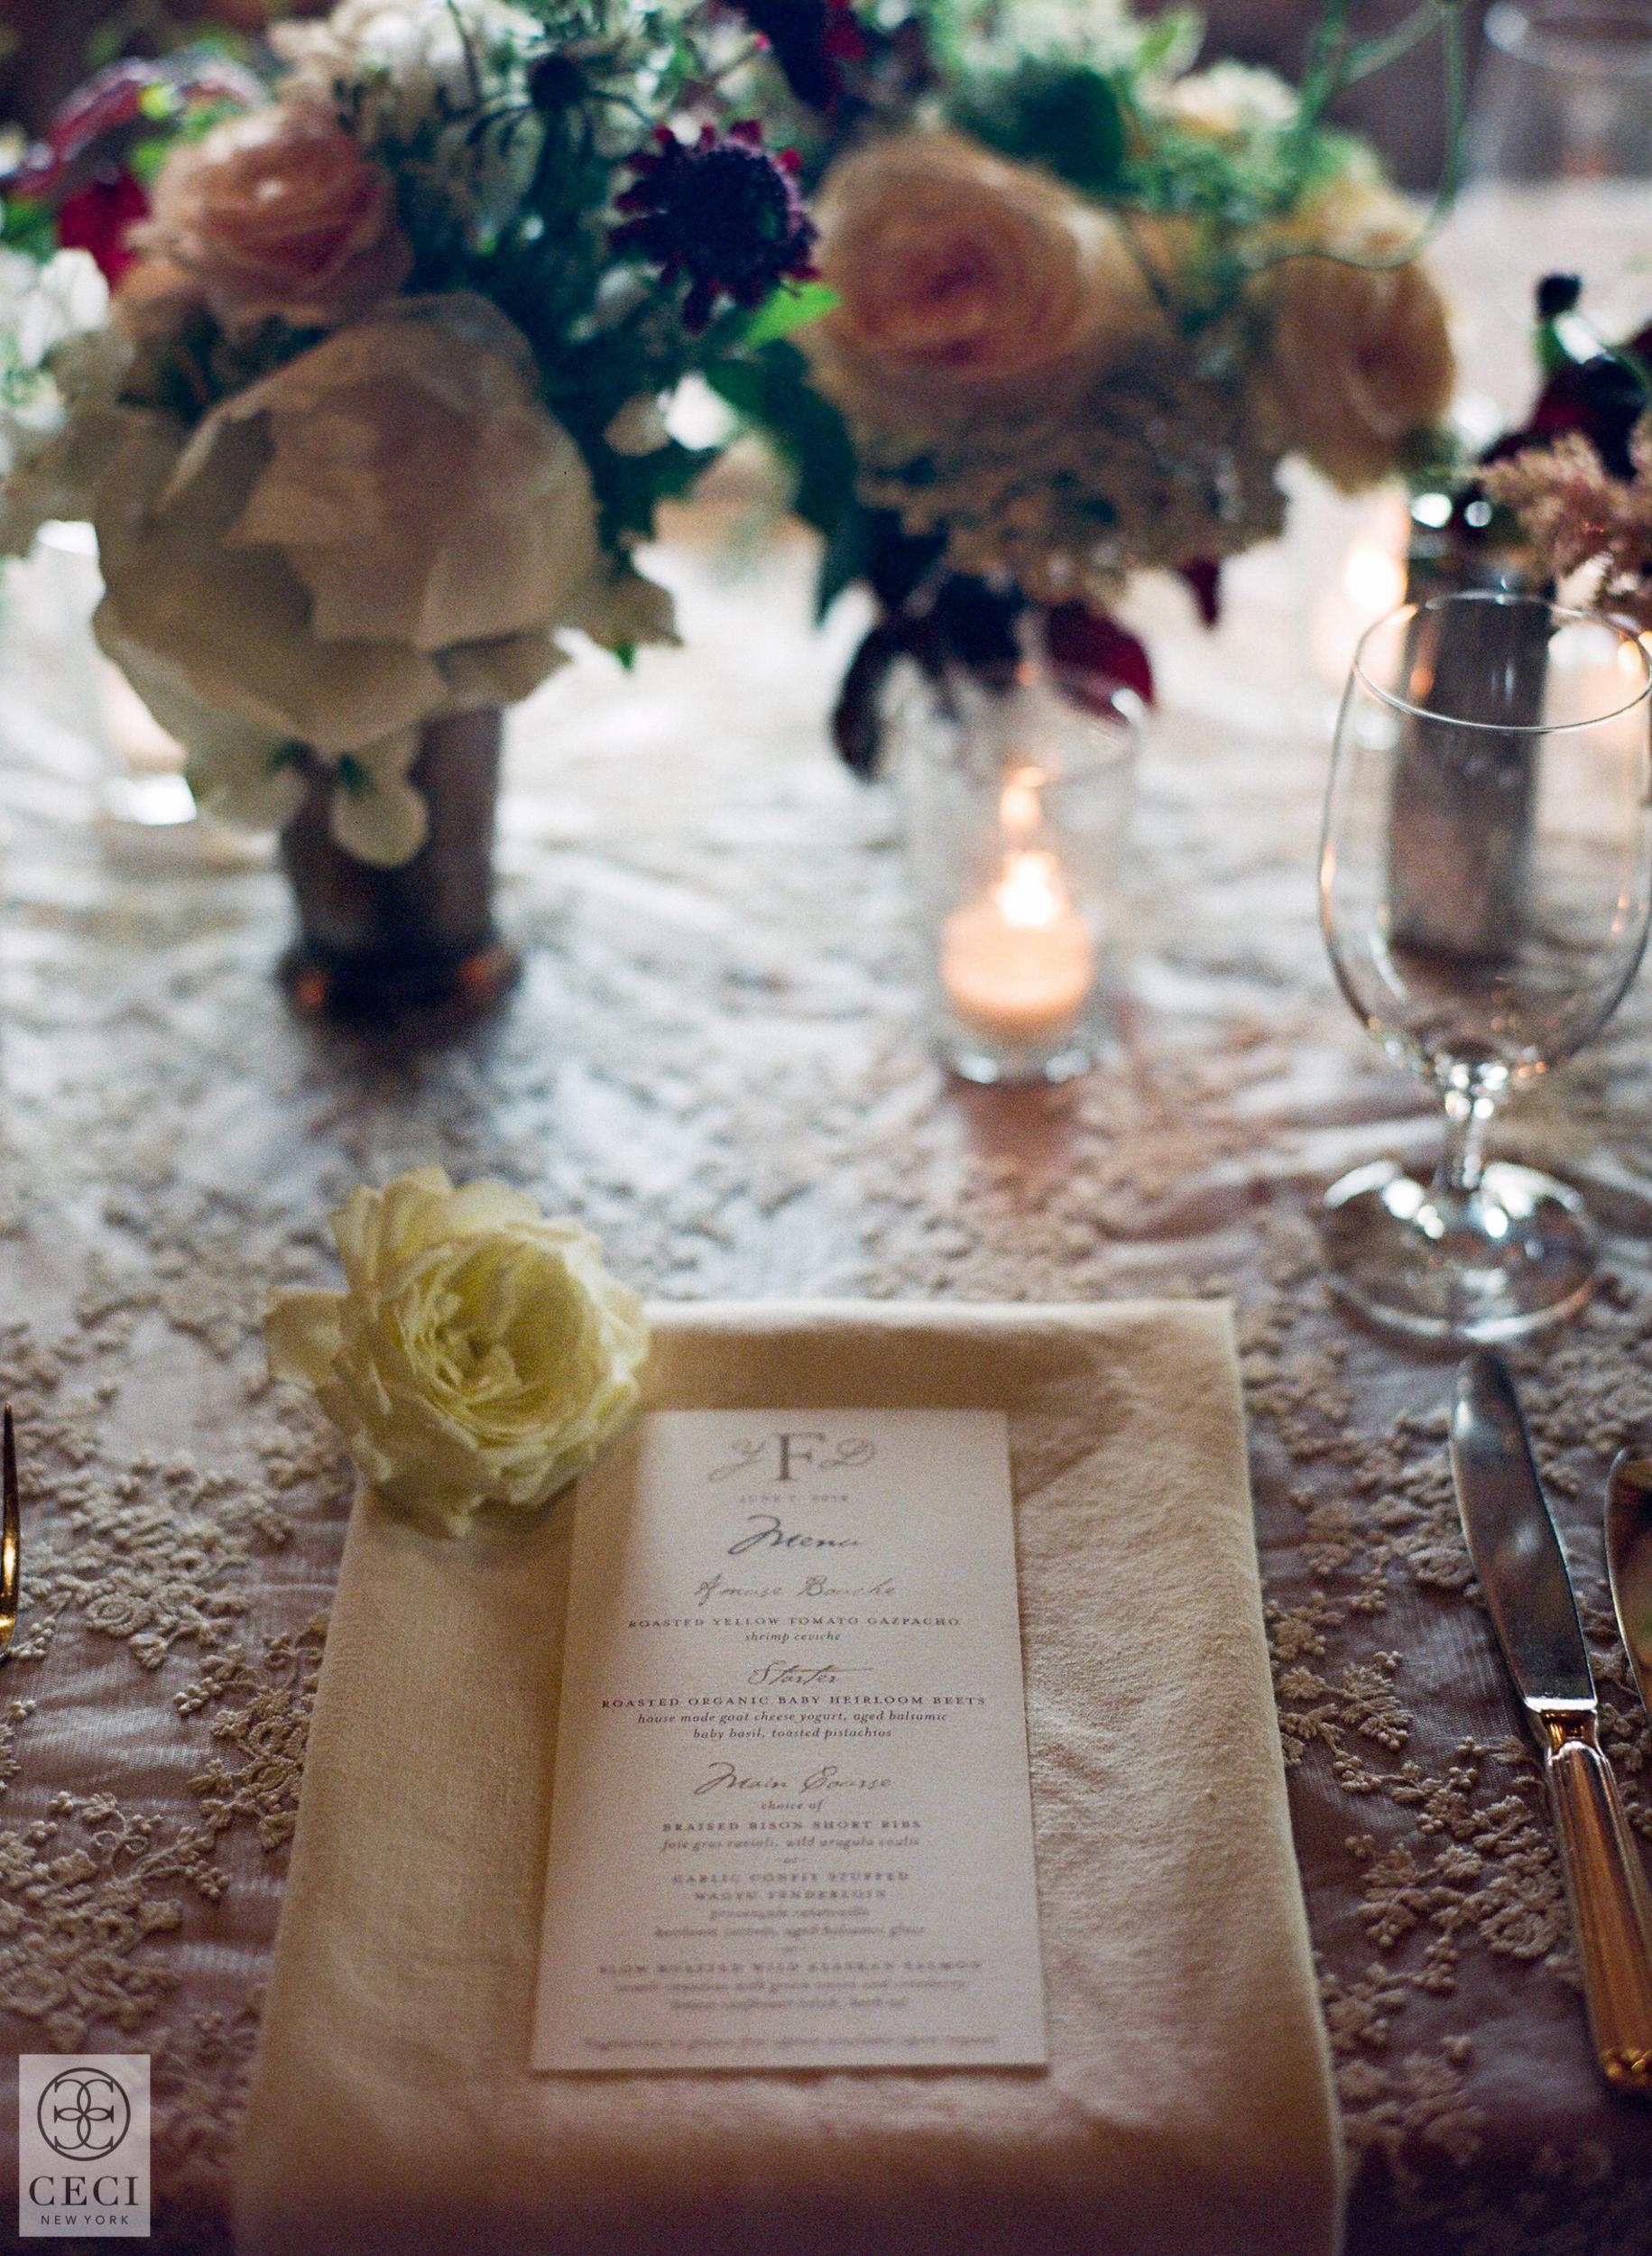 Ceci_New_York_Lyndsey_Hamilton_Events_Invitations_Wedding_Amangani_Elegance_Gold_Foil_Letterpress_Classic_Stamping_Custom_Couture_Personalized-13.jpg